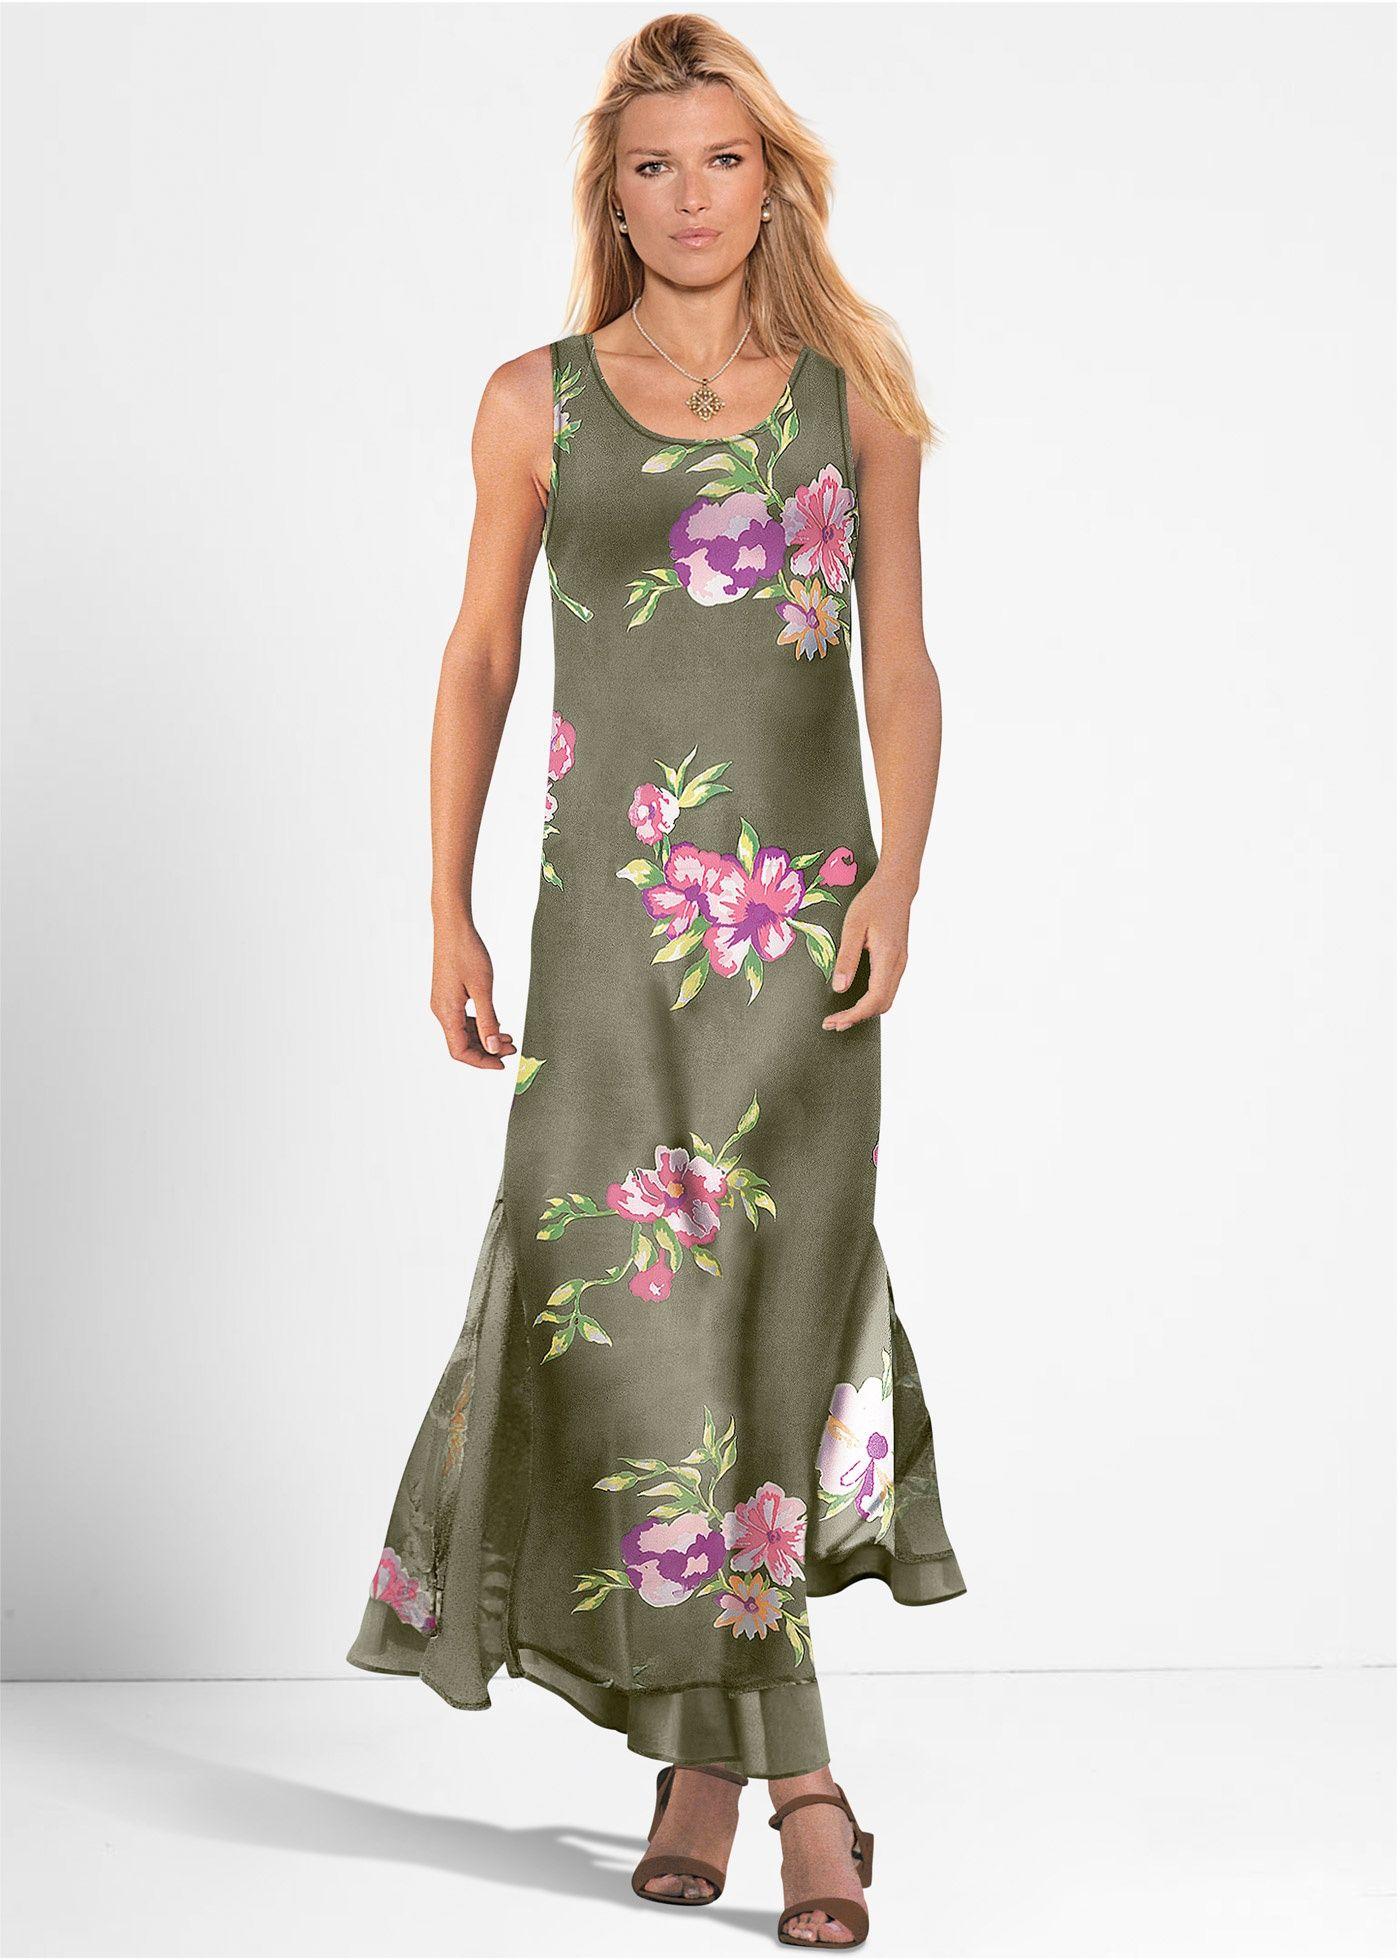 Kleid oliv geblümt - bpc selection jetzt im Online Shop ...